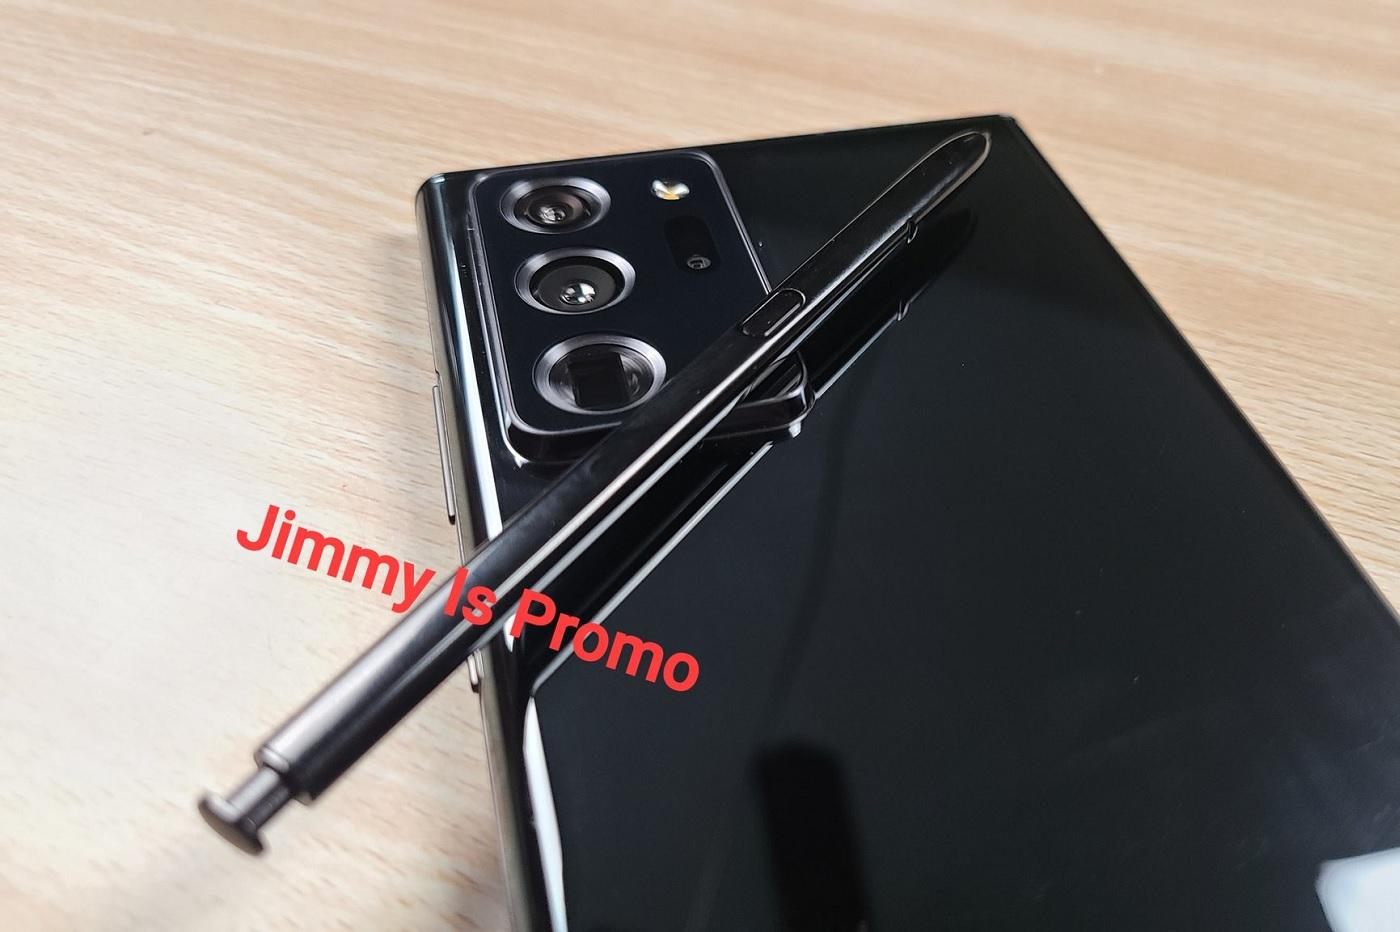 Une photo présumée du Samsung Galaxy Note 20 Ultra